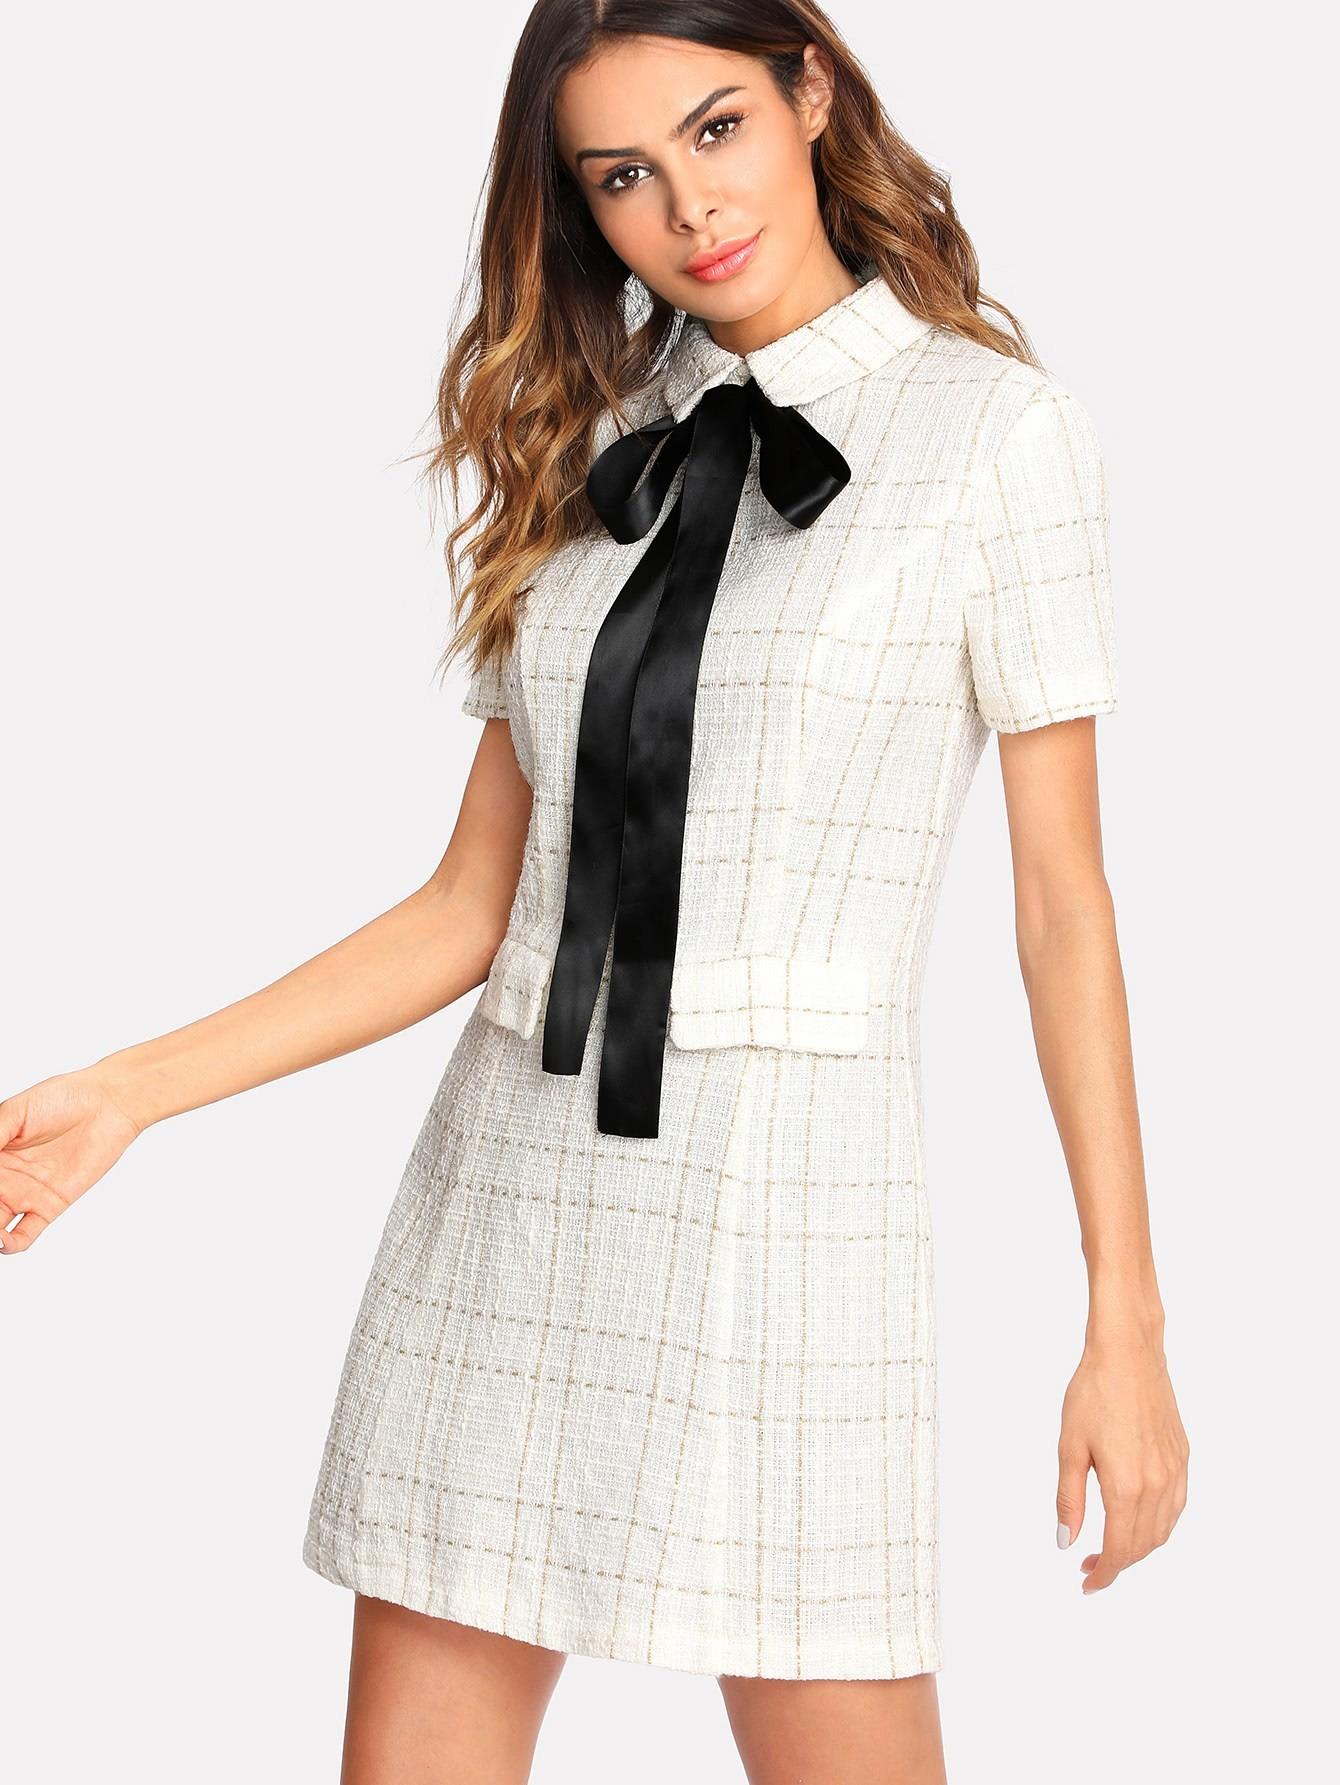 Contrast Tie Neck Faux Pocket Tweed Dress contrast tie neck faux pocket tweed dress